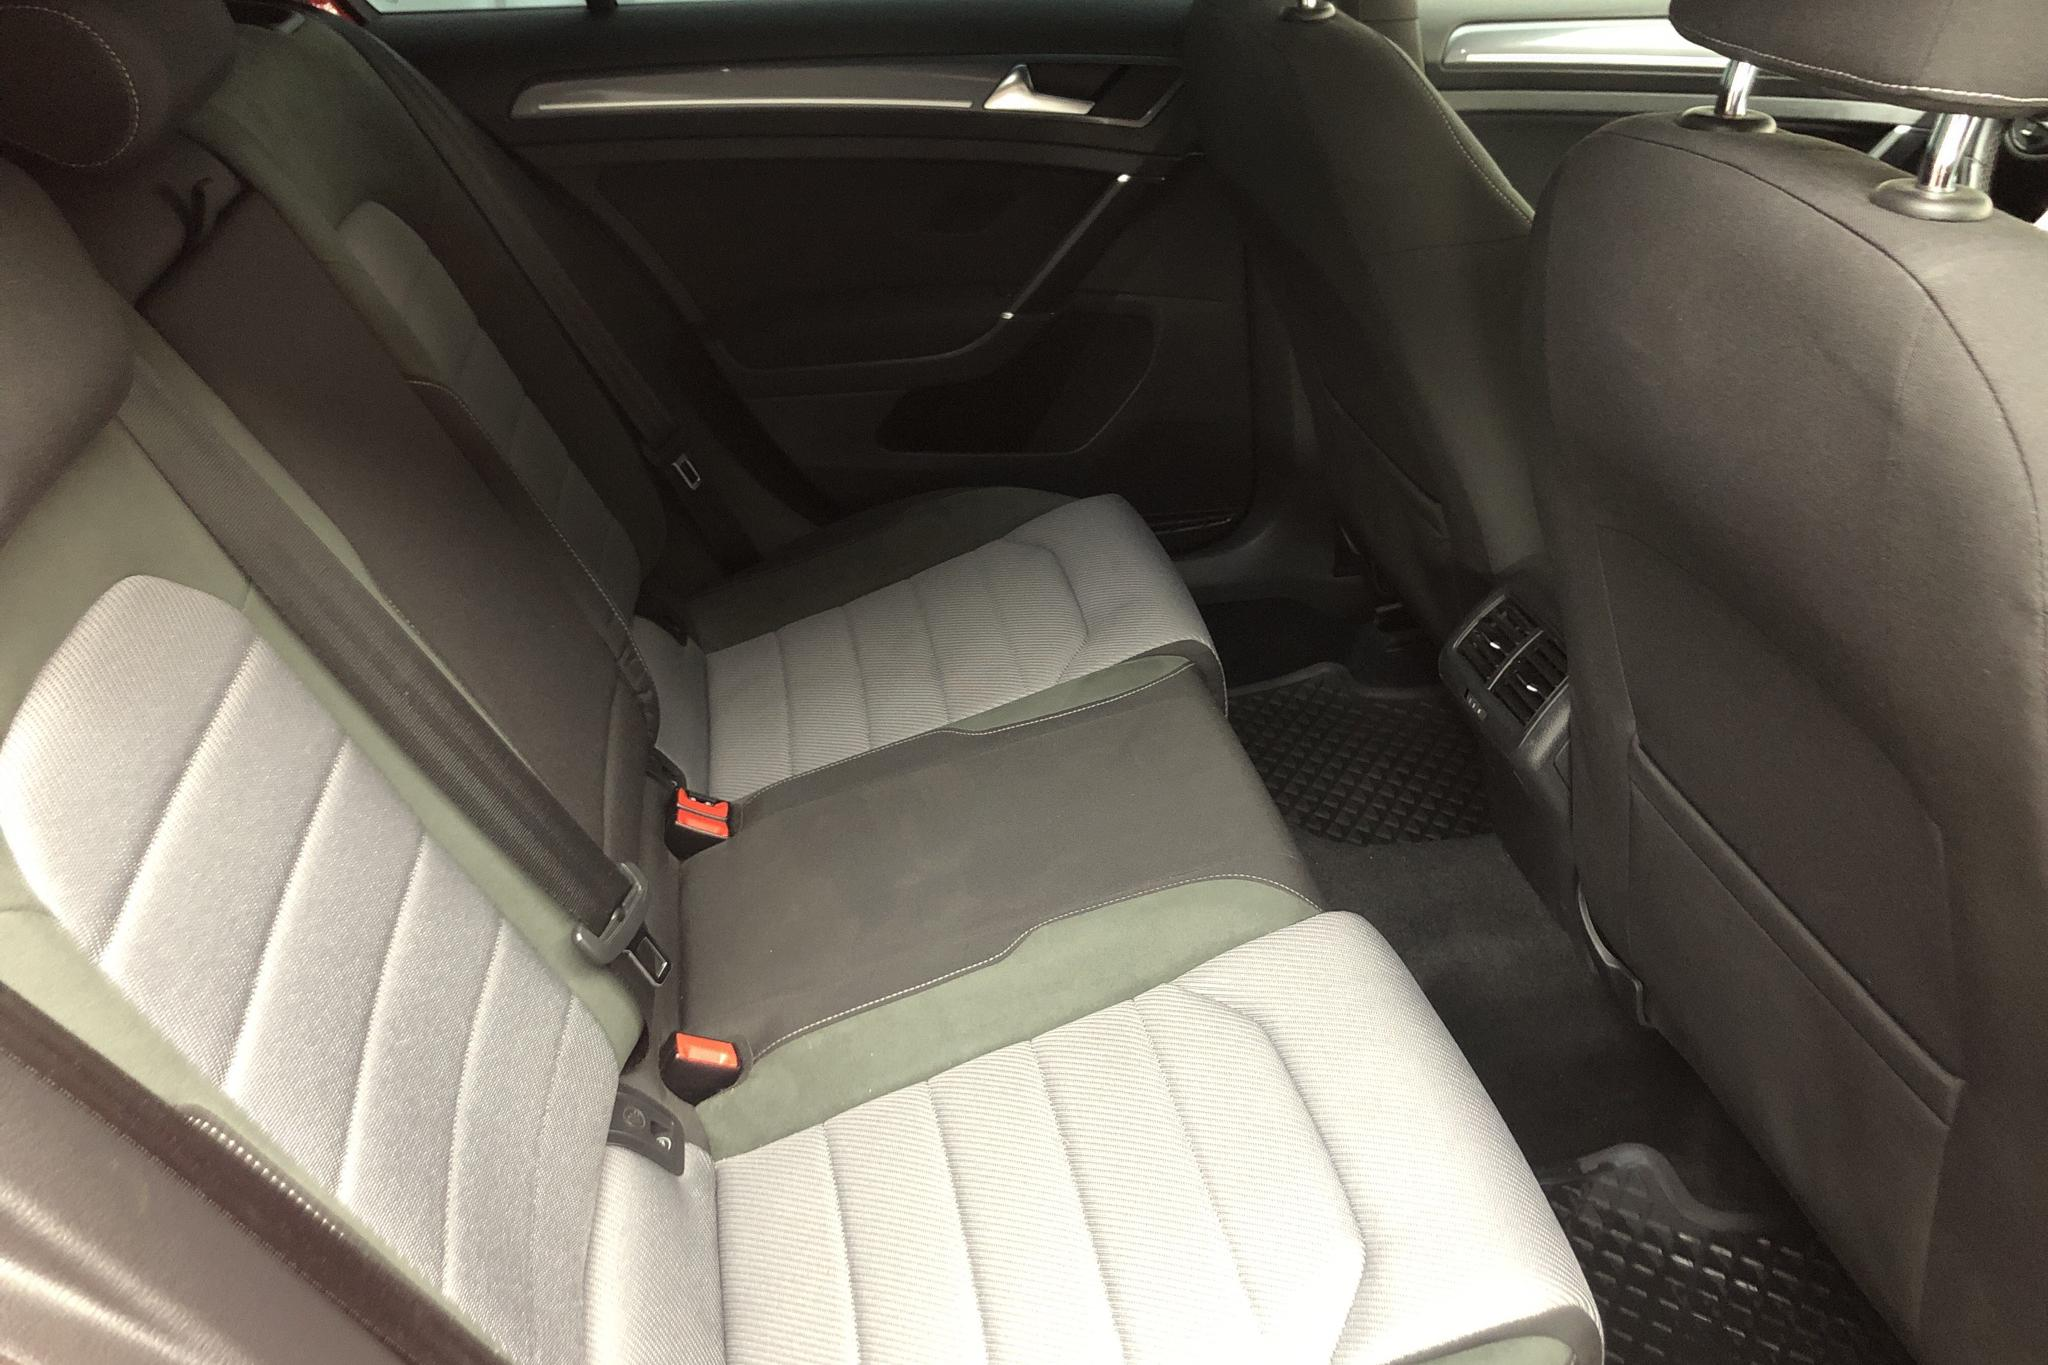 VW Golf VII 1.4 TSI 5dr (150hk) - 7 194 mil - Manuell - röd - 2017